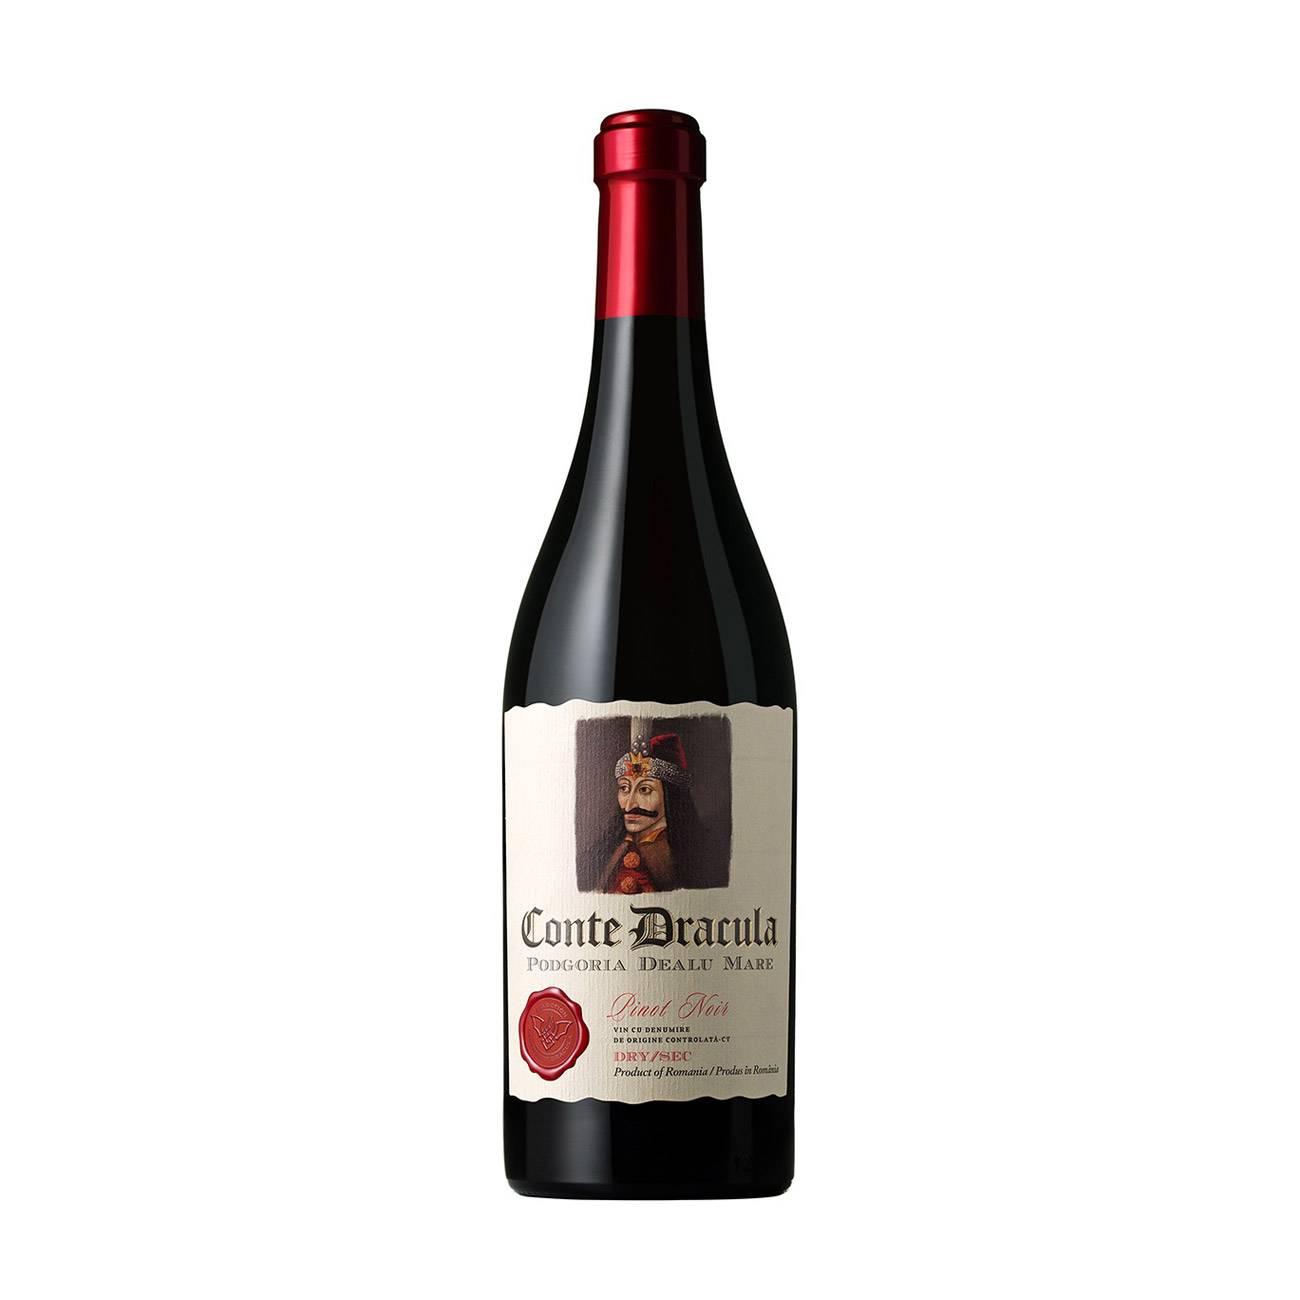 Conte Dracula Pinot Noir 750 Ml 750 Ml de la Legendary Dracula